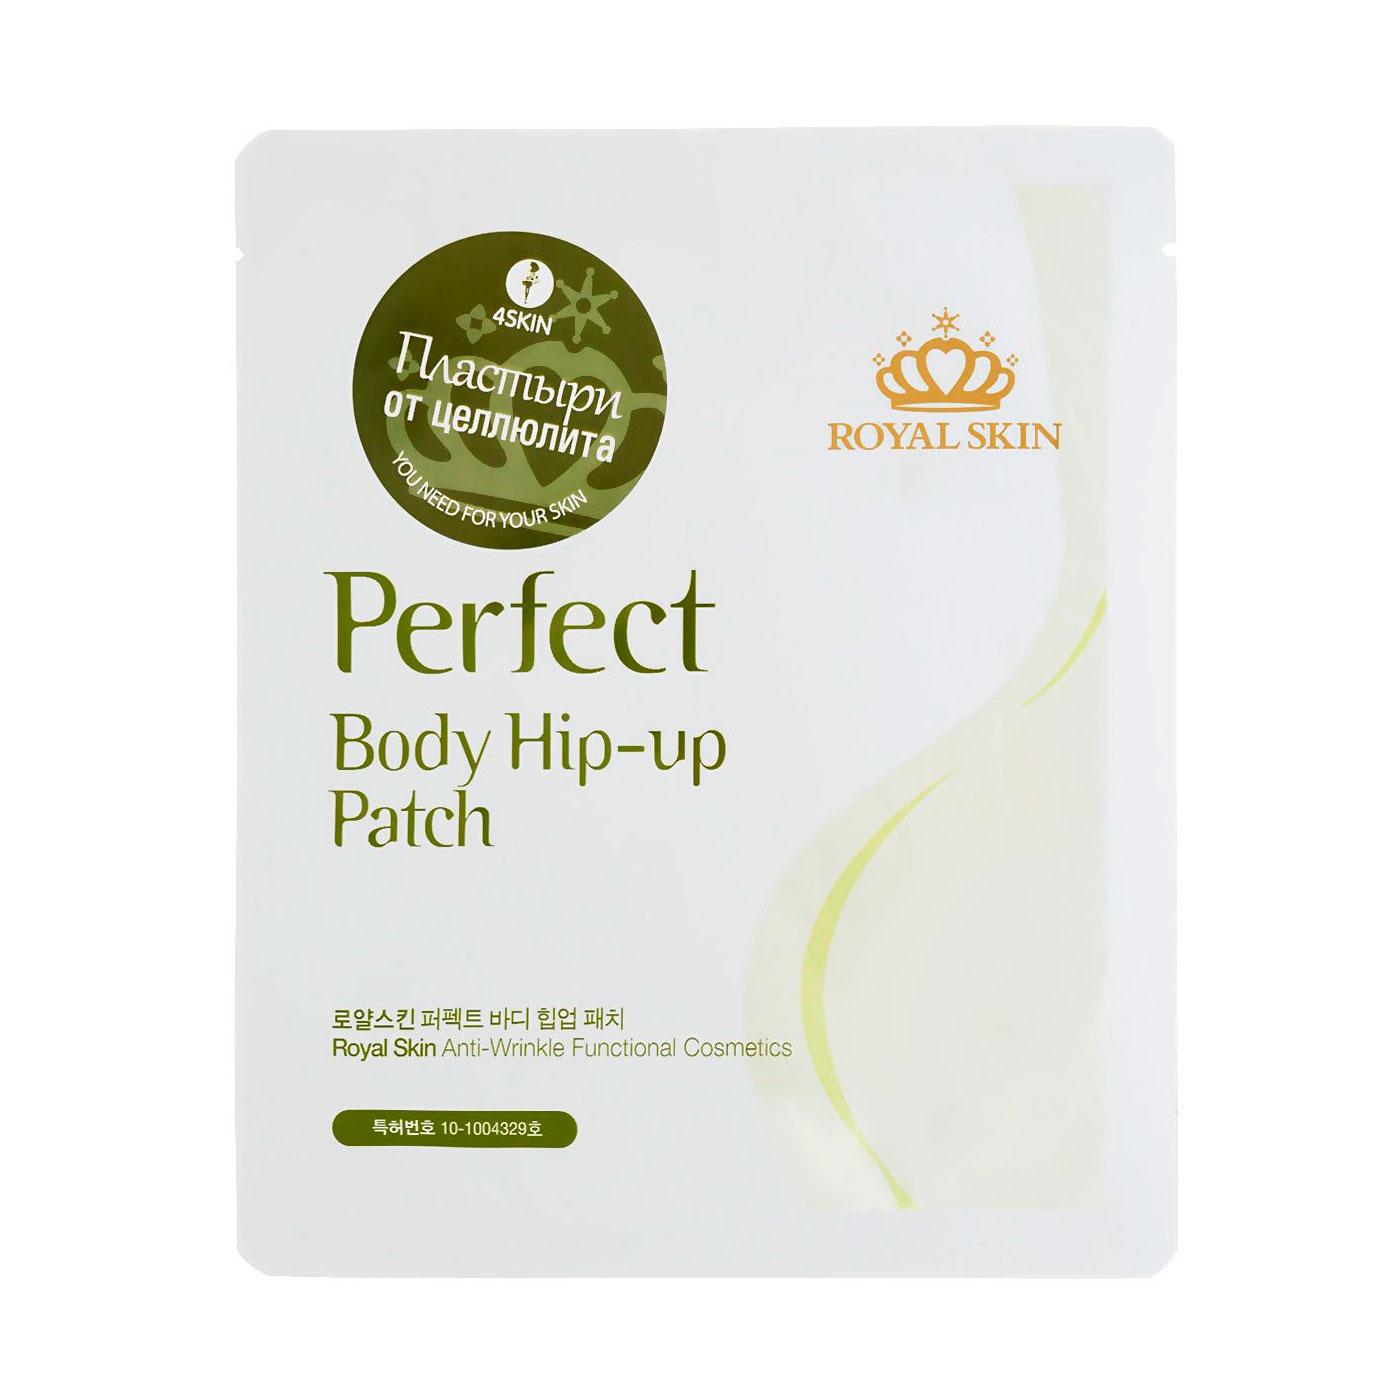 Патчи-маски Royal Skin 2 шт от целлюлита и для увеличения эластичности кожи бедер